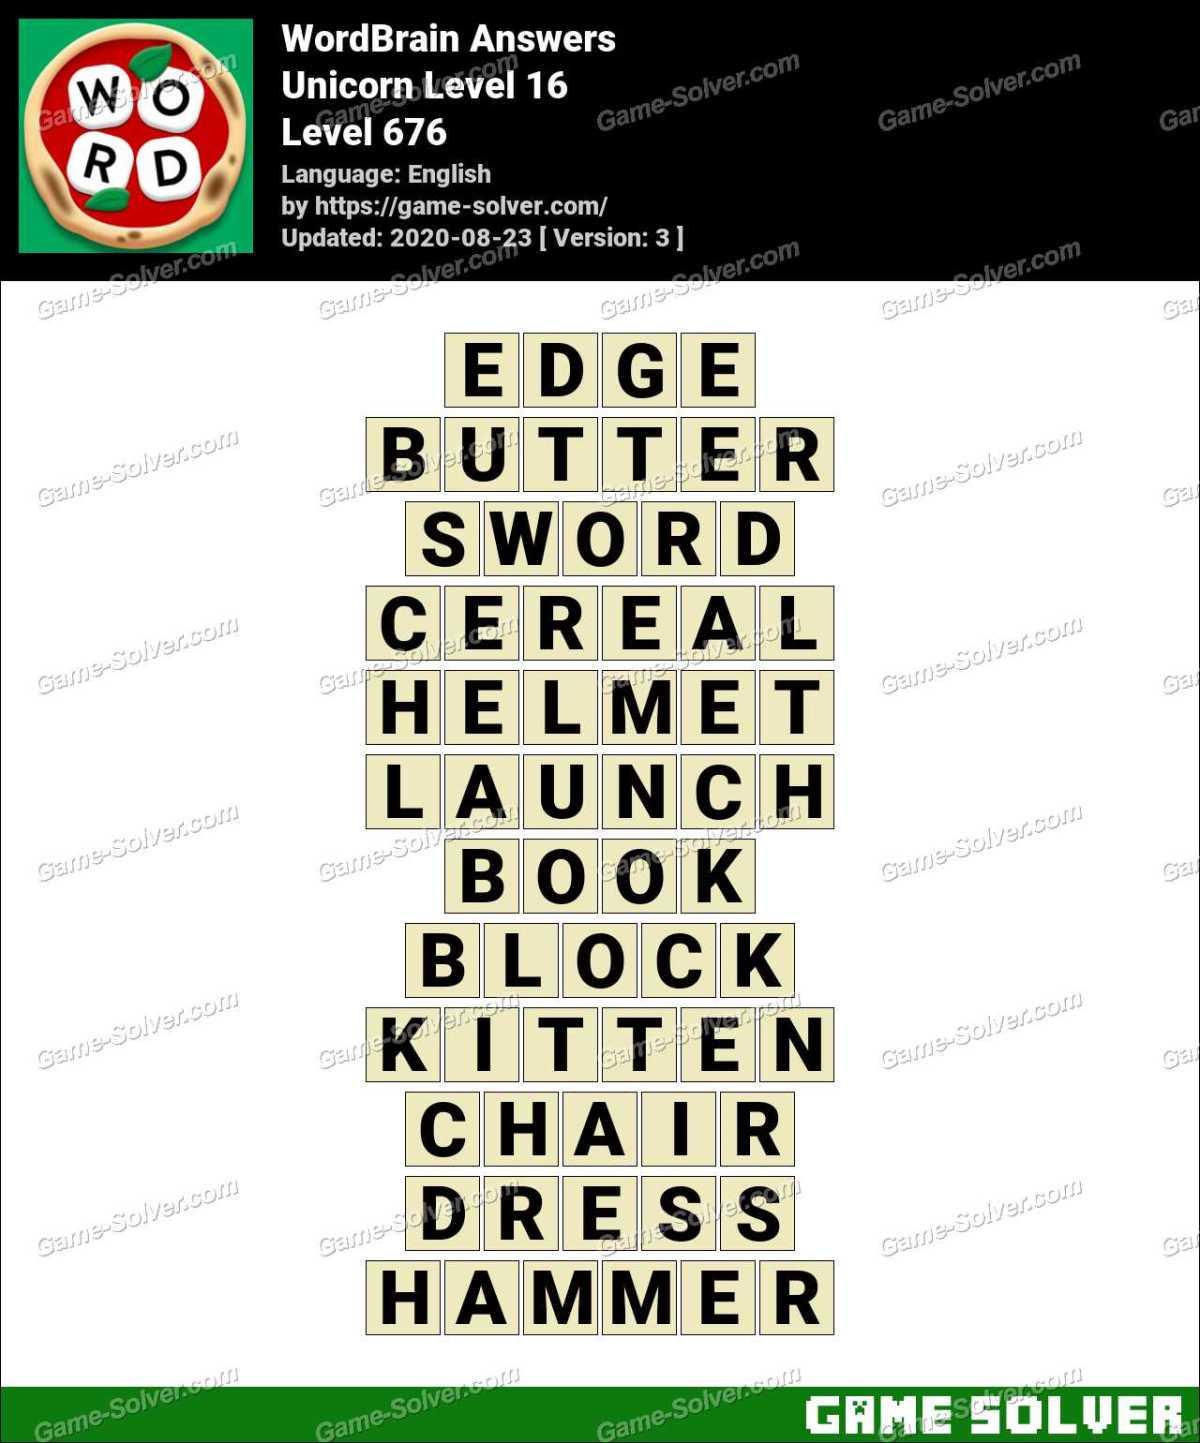 WordBrain Unicorn Level 16 Answers